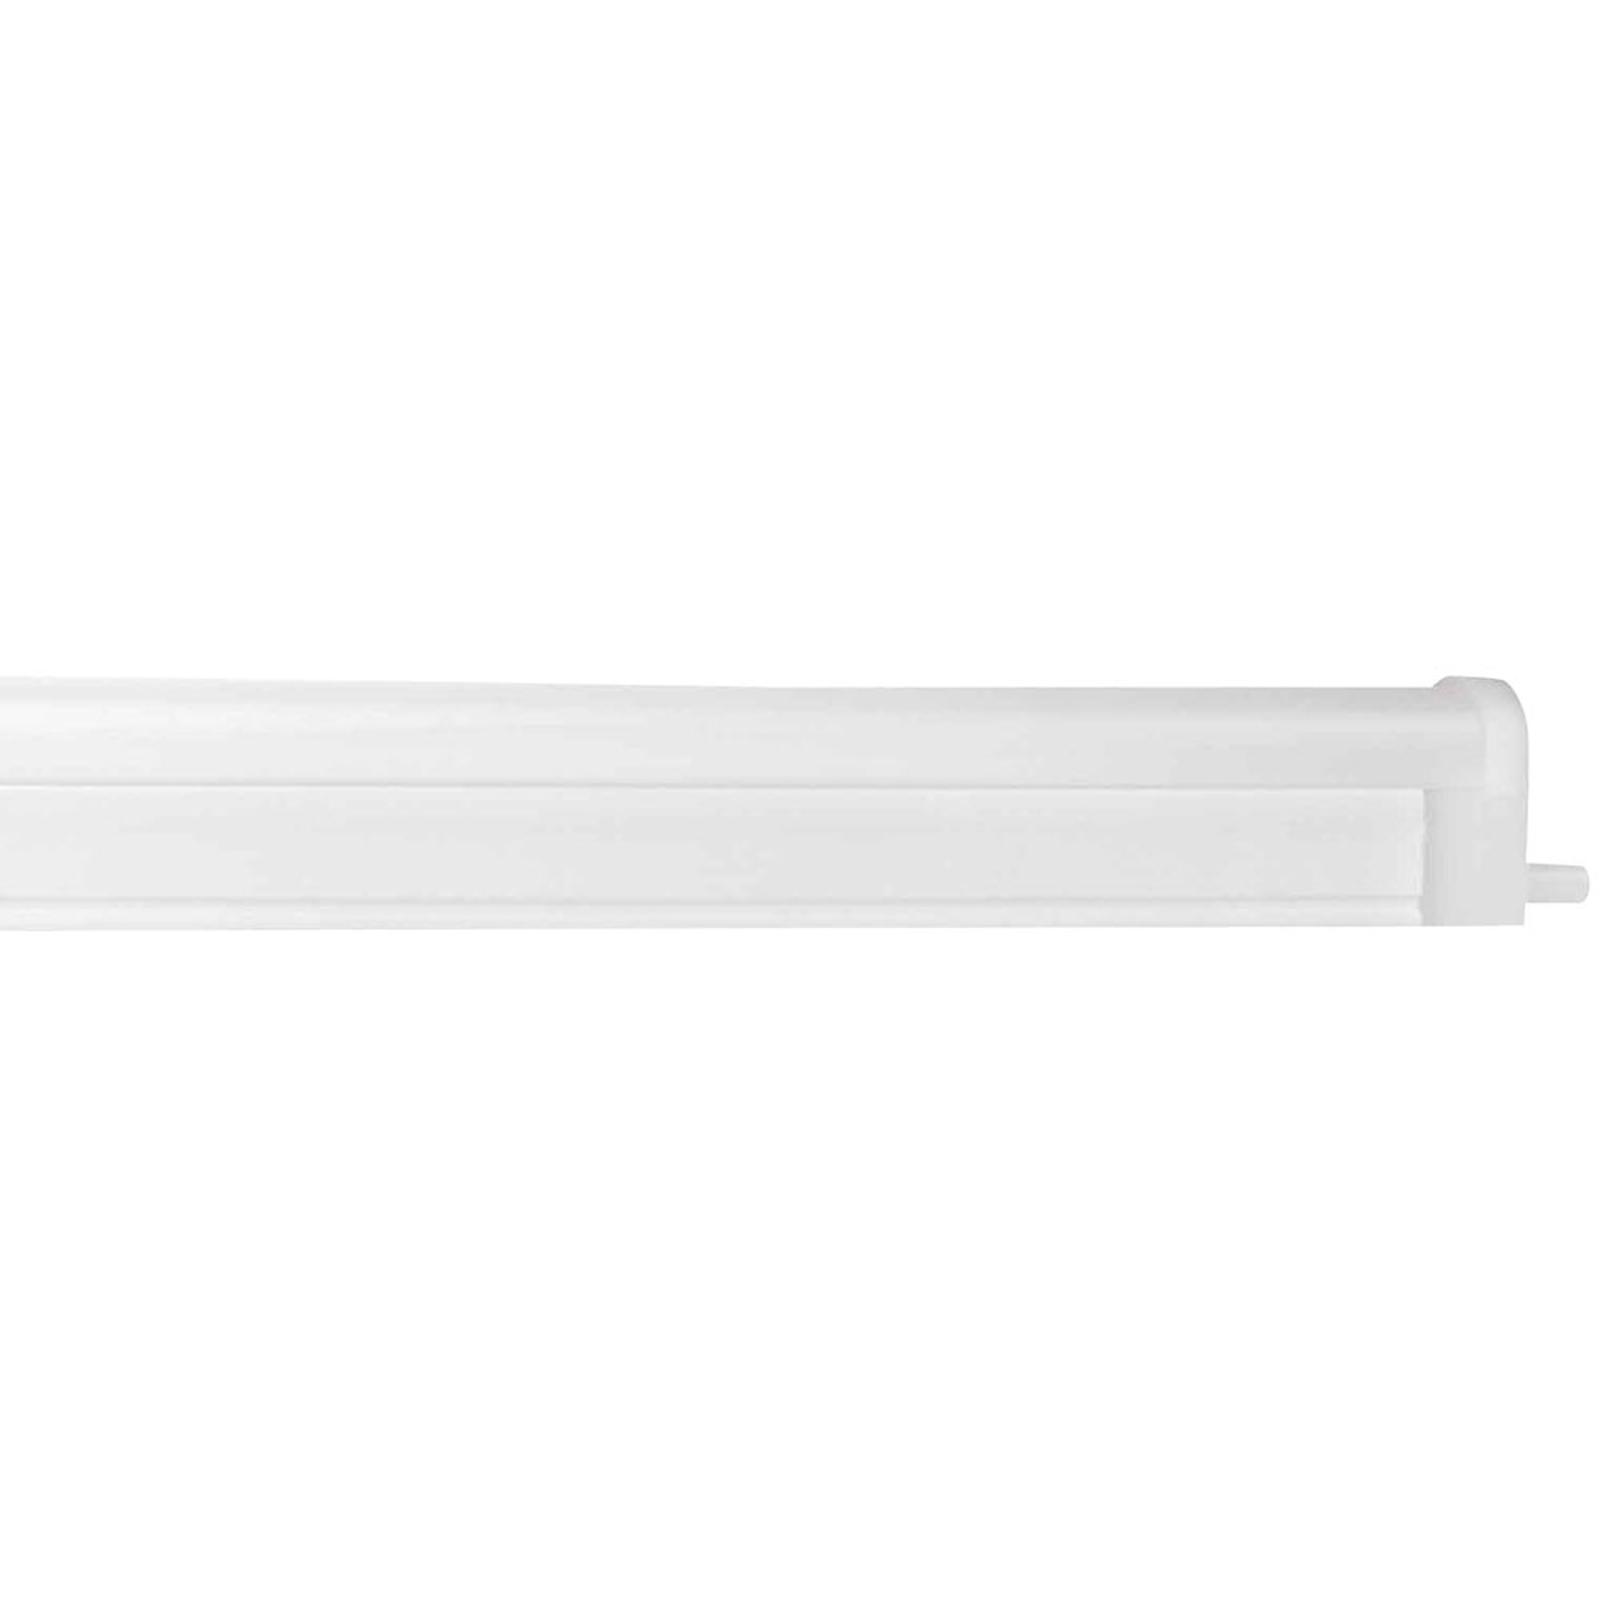 Megaman Pinolite LED-Pflanzenleuchte, 58 cm, 8,5 W